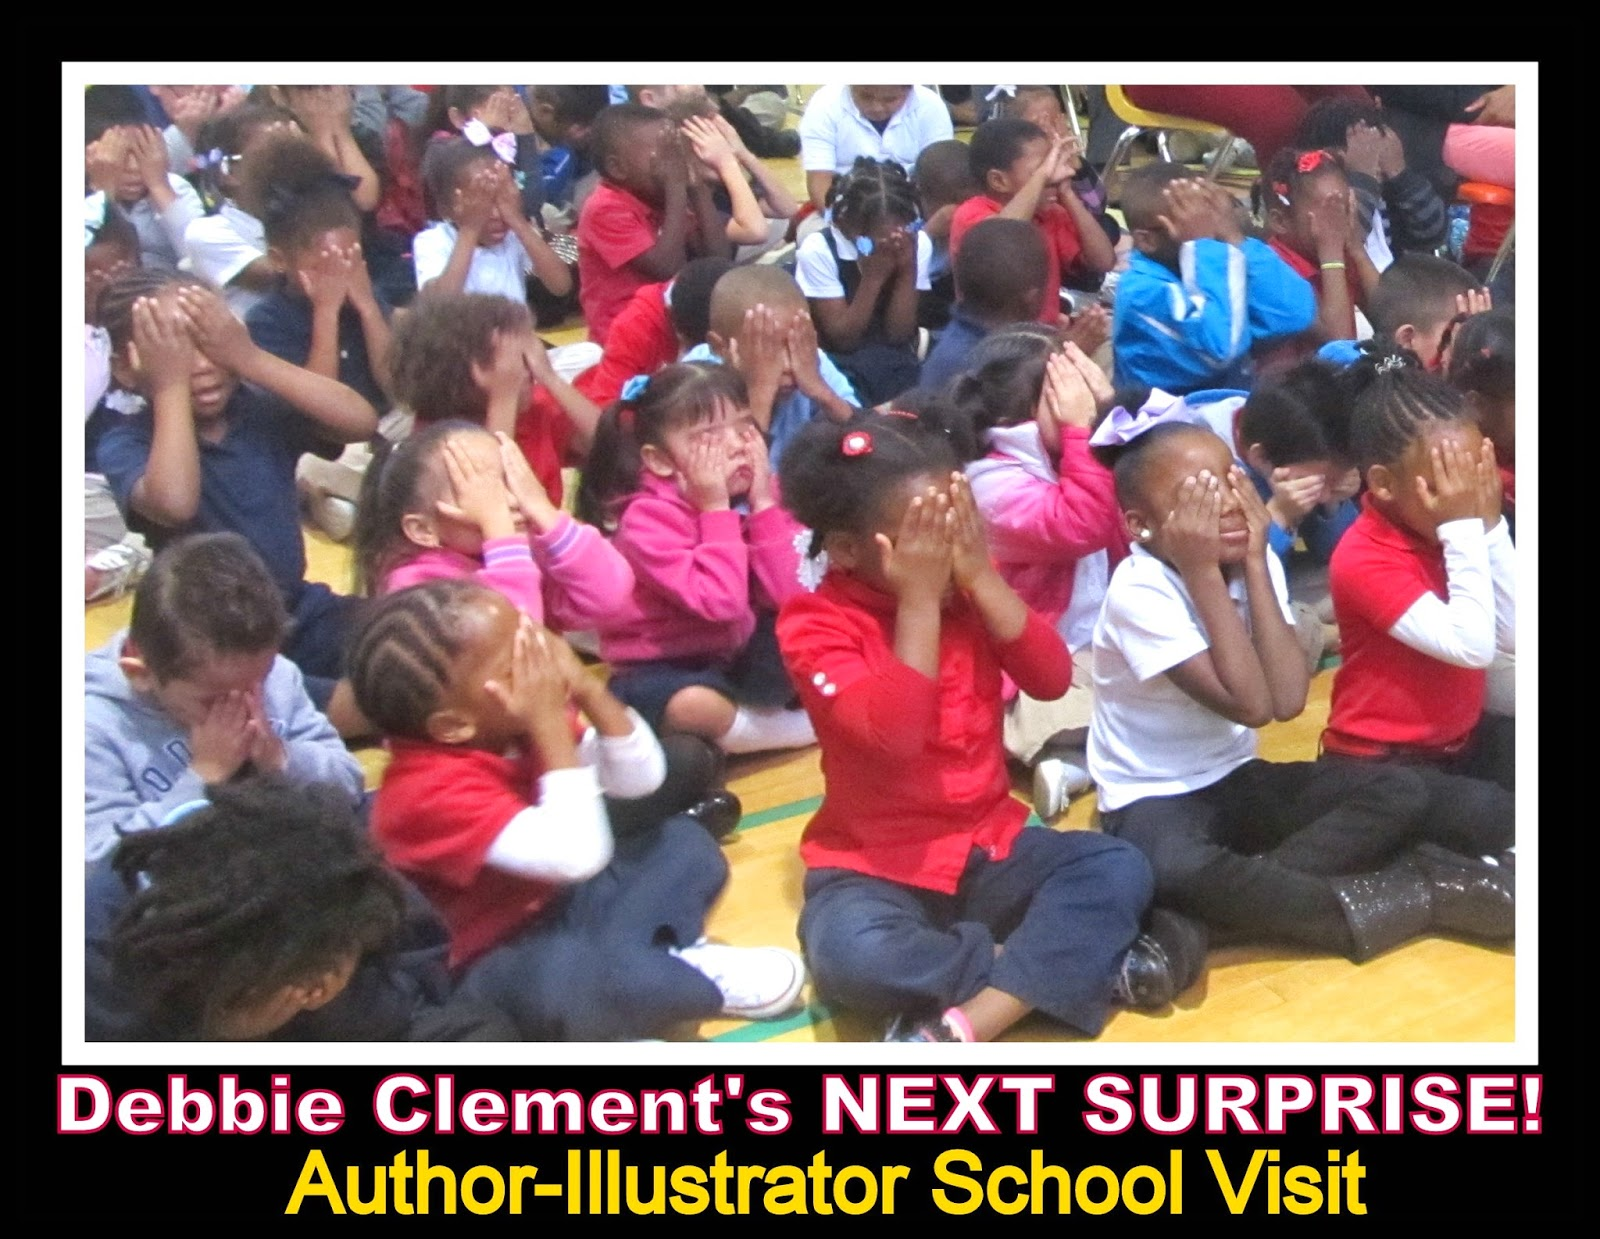 Elementary School Author-Illustrator School Visit with Debbie Clement